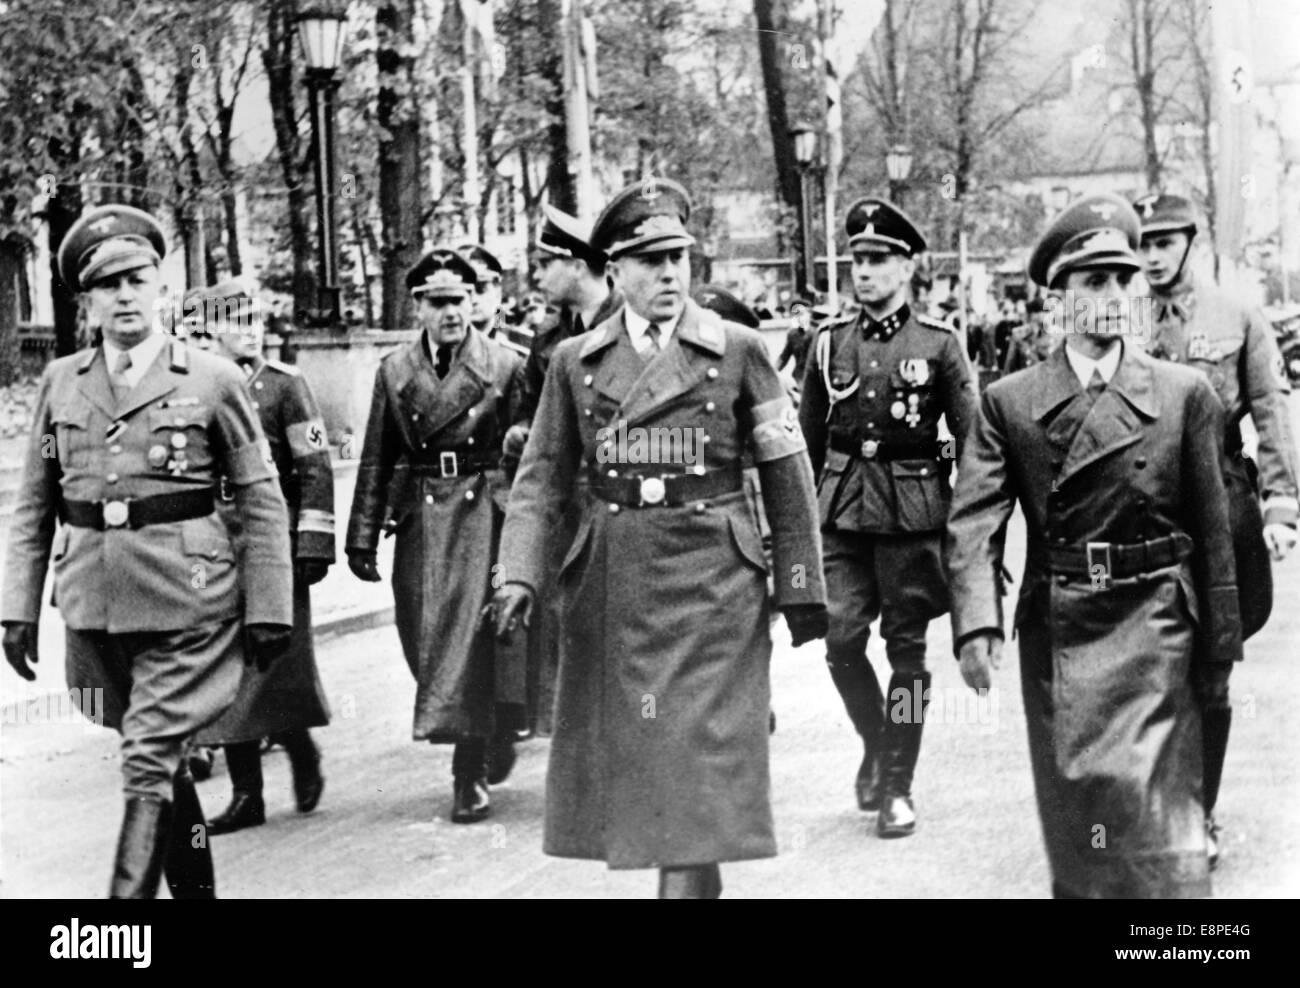 dr joseph goebbels and the nazi propaganda The former secretary to nazi germany's propaganda boss joseph goebbels has  died aged 106.